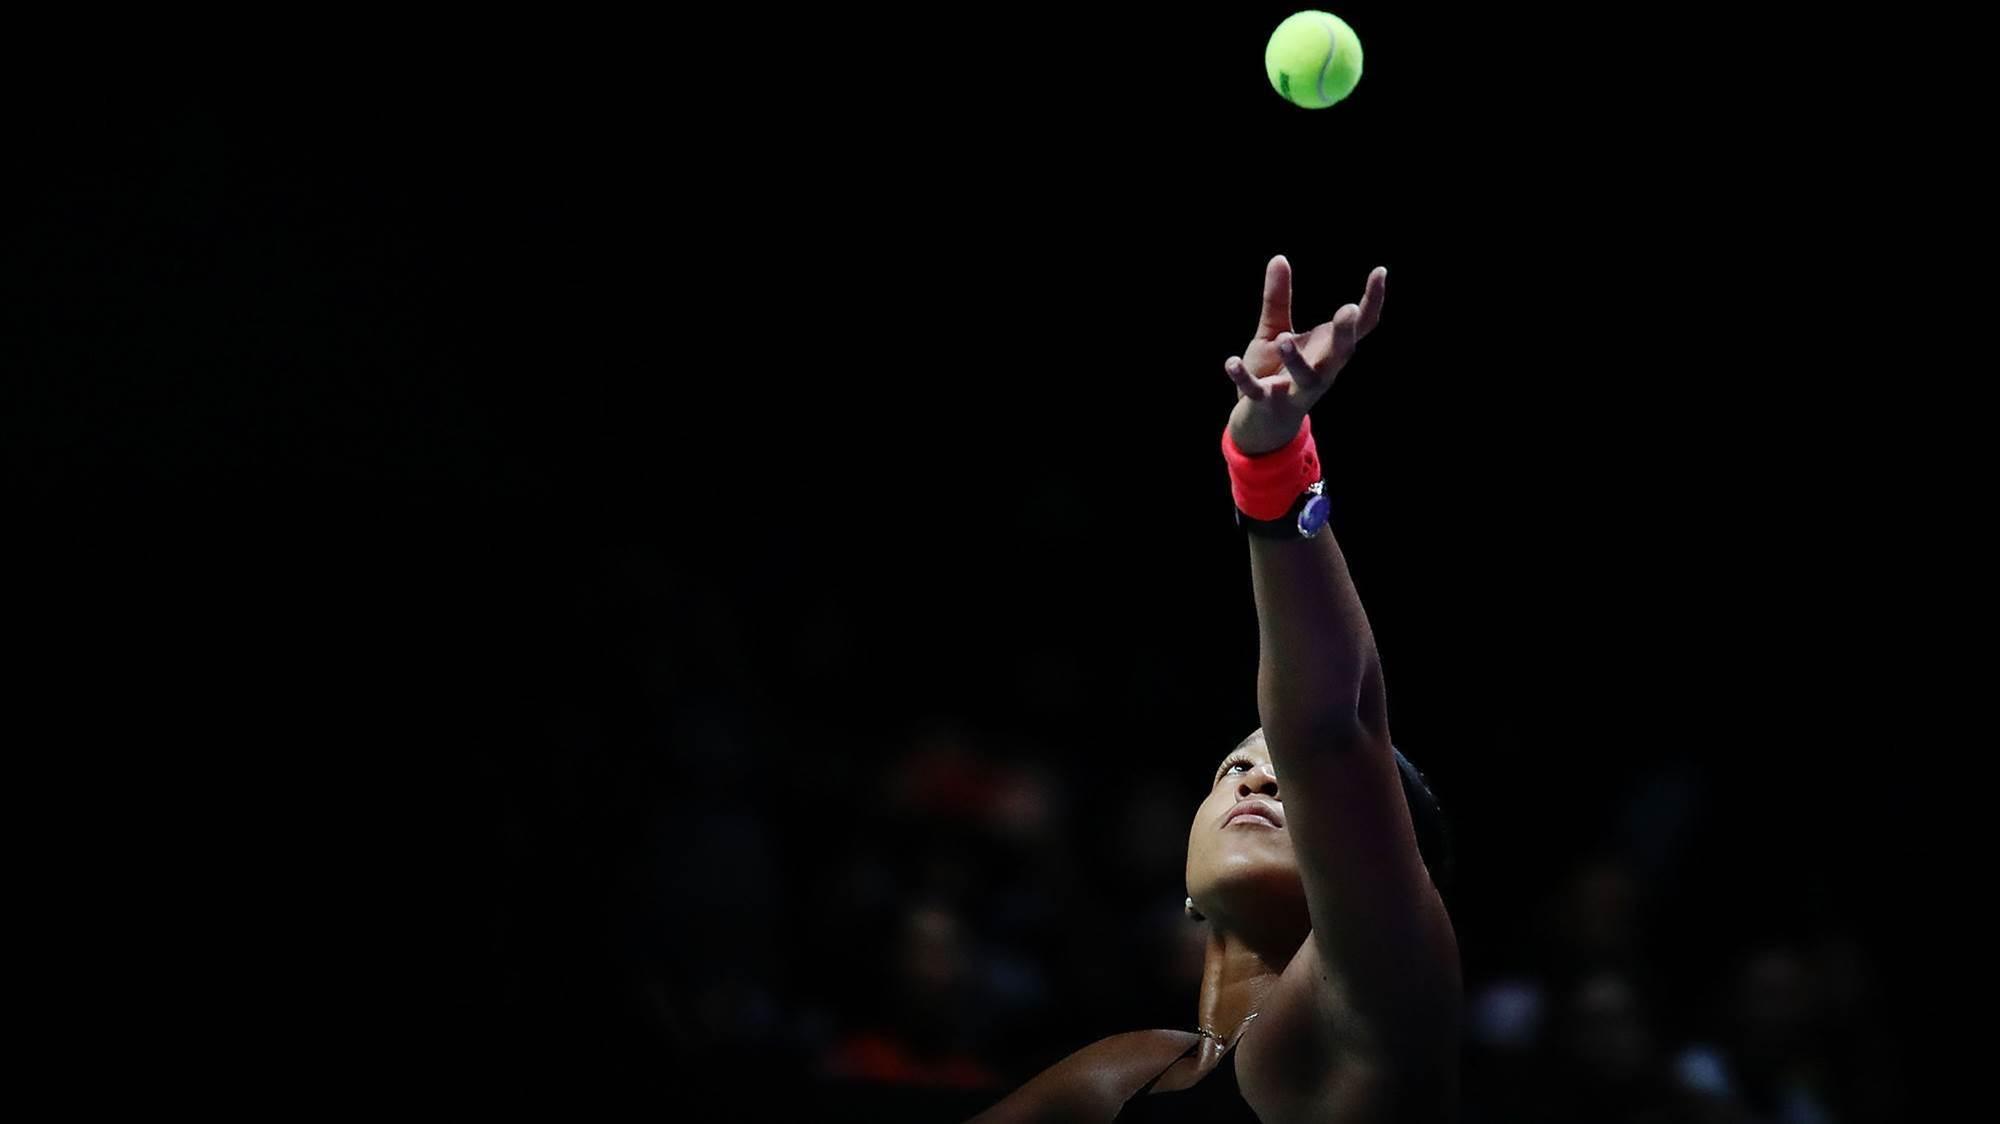 Koalas, snakes and tennis with Naomi Osaka